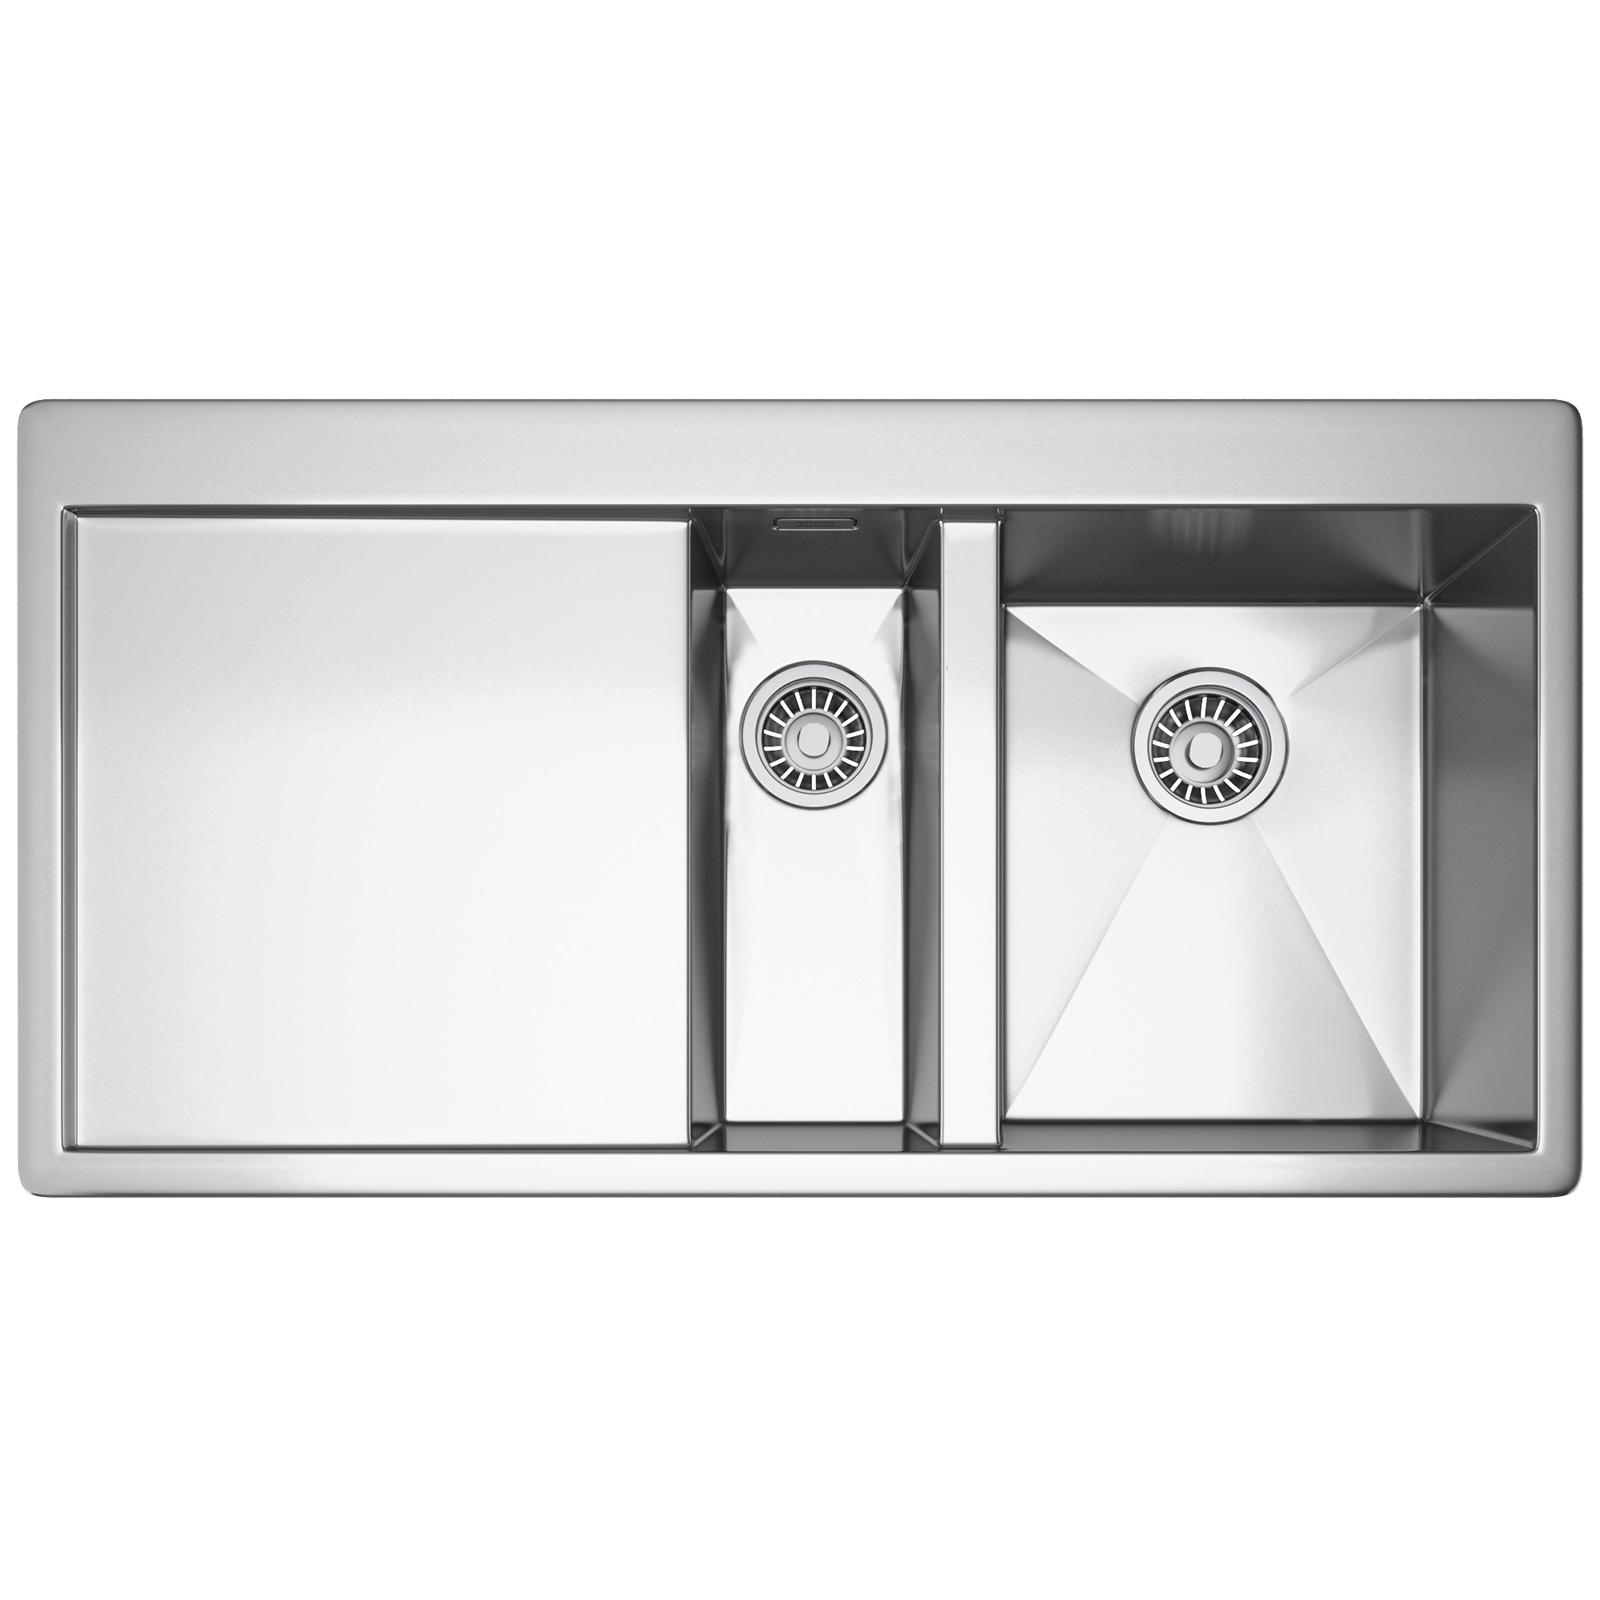 franke planar ppx 251 stainless steel left hand drainer 15 bowl inset sink - Franke Sink